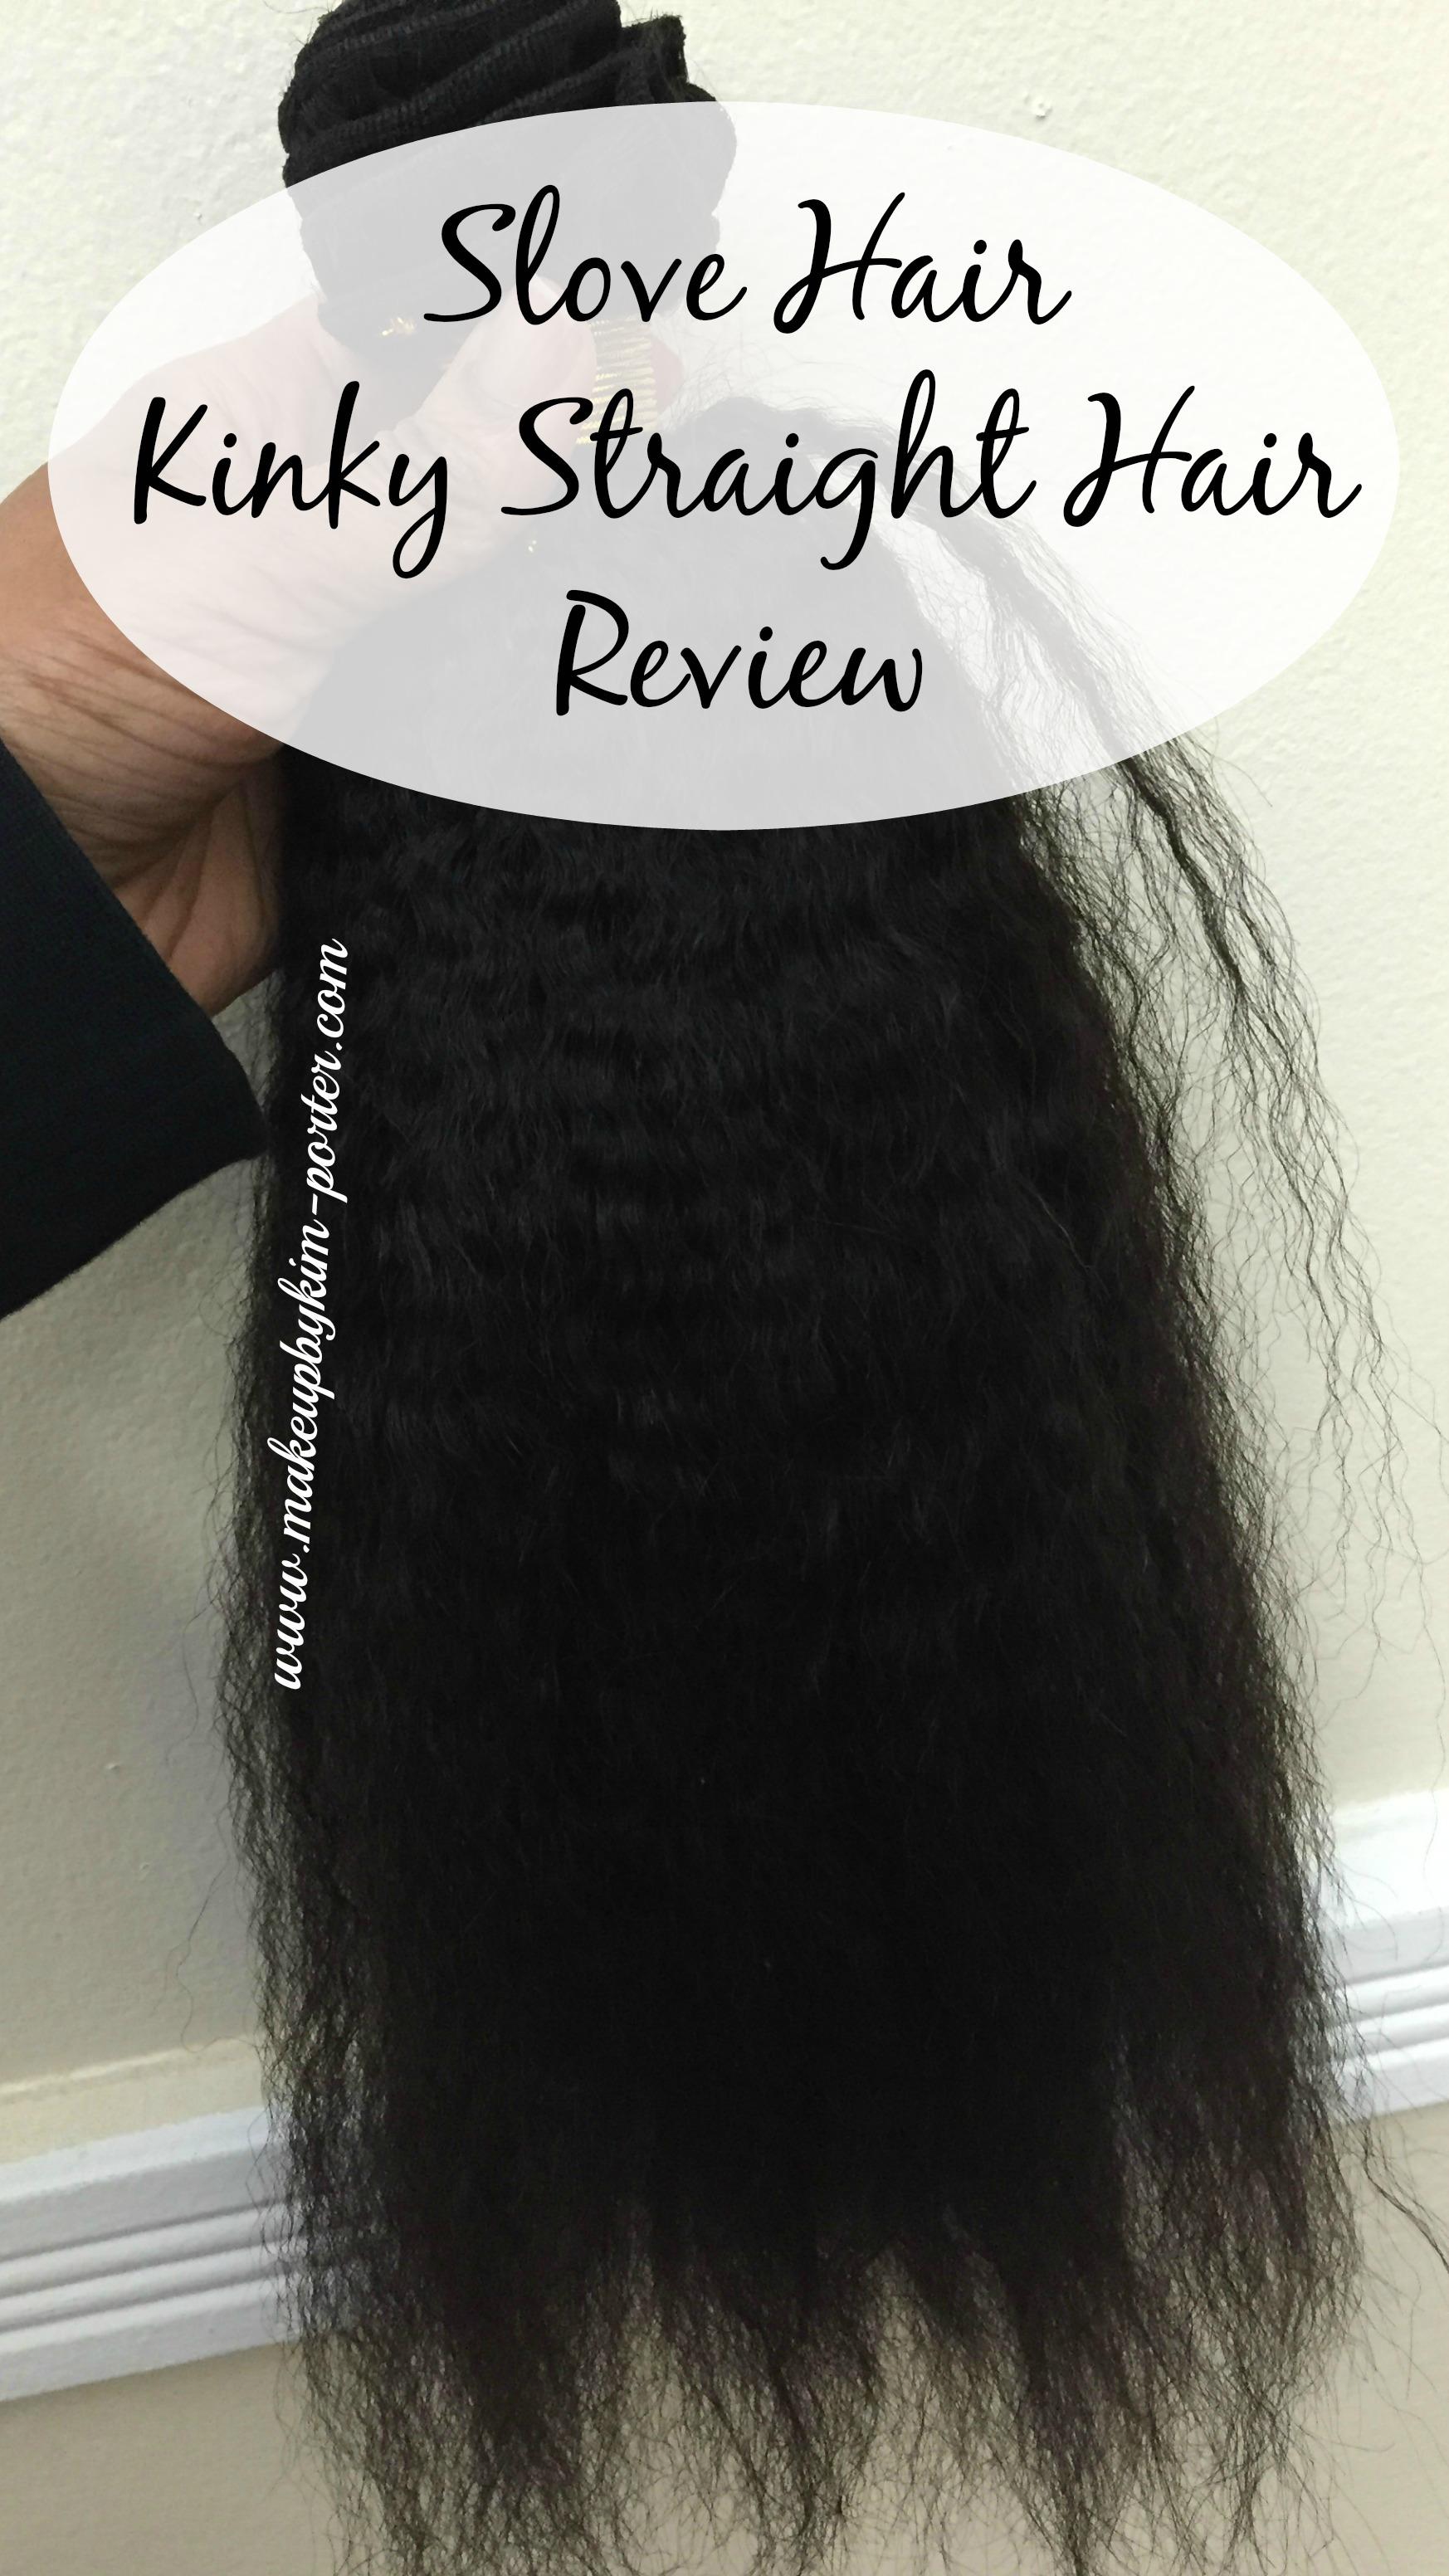 Slove Hair Kinky Straight Hair Review Install